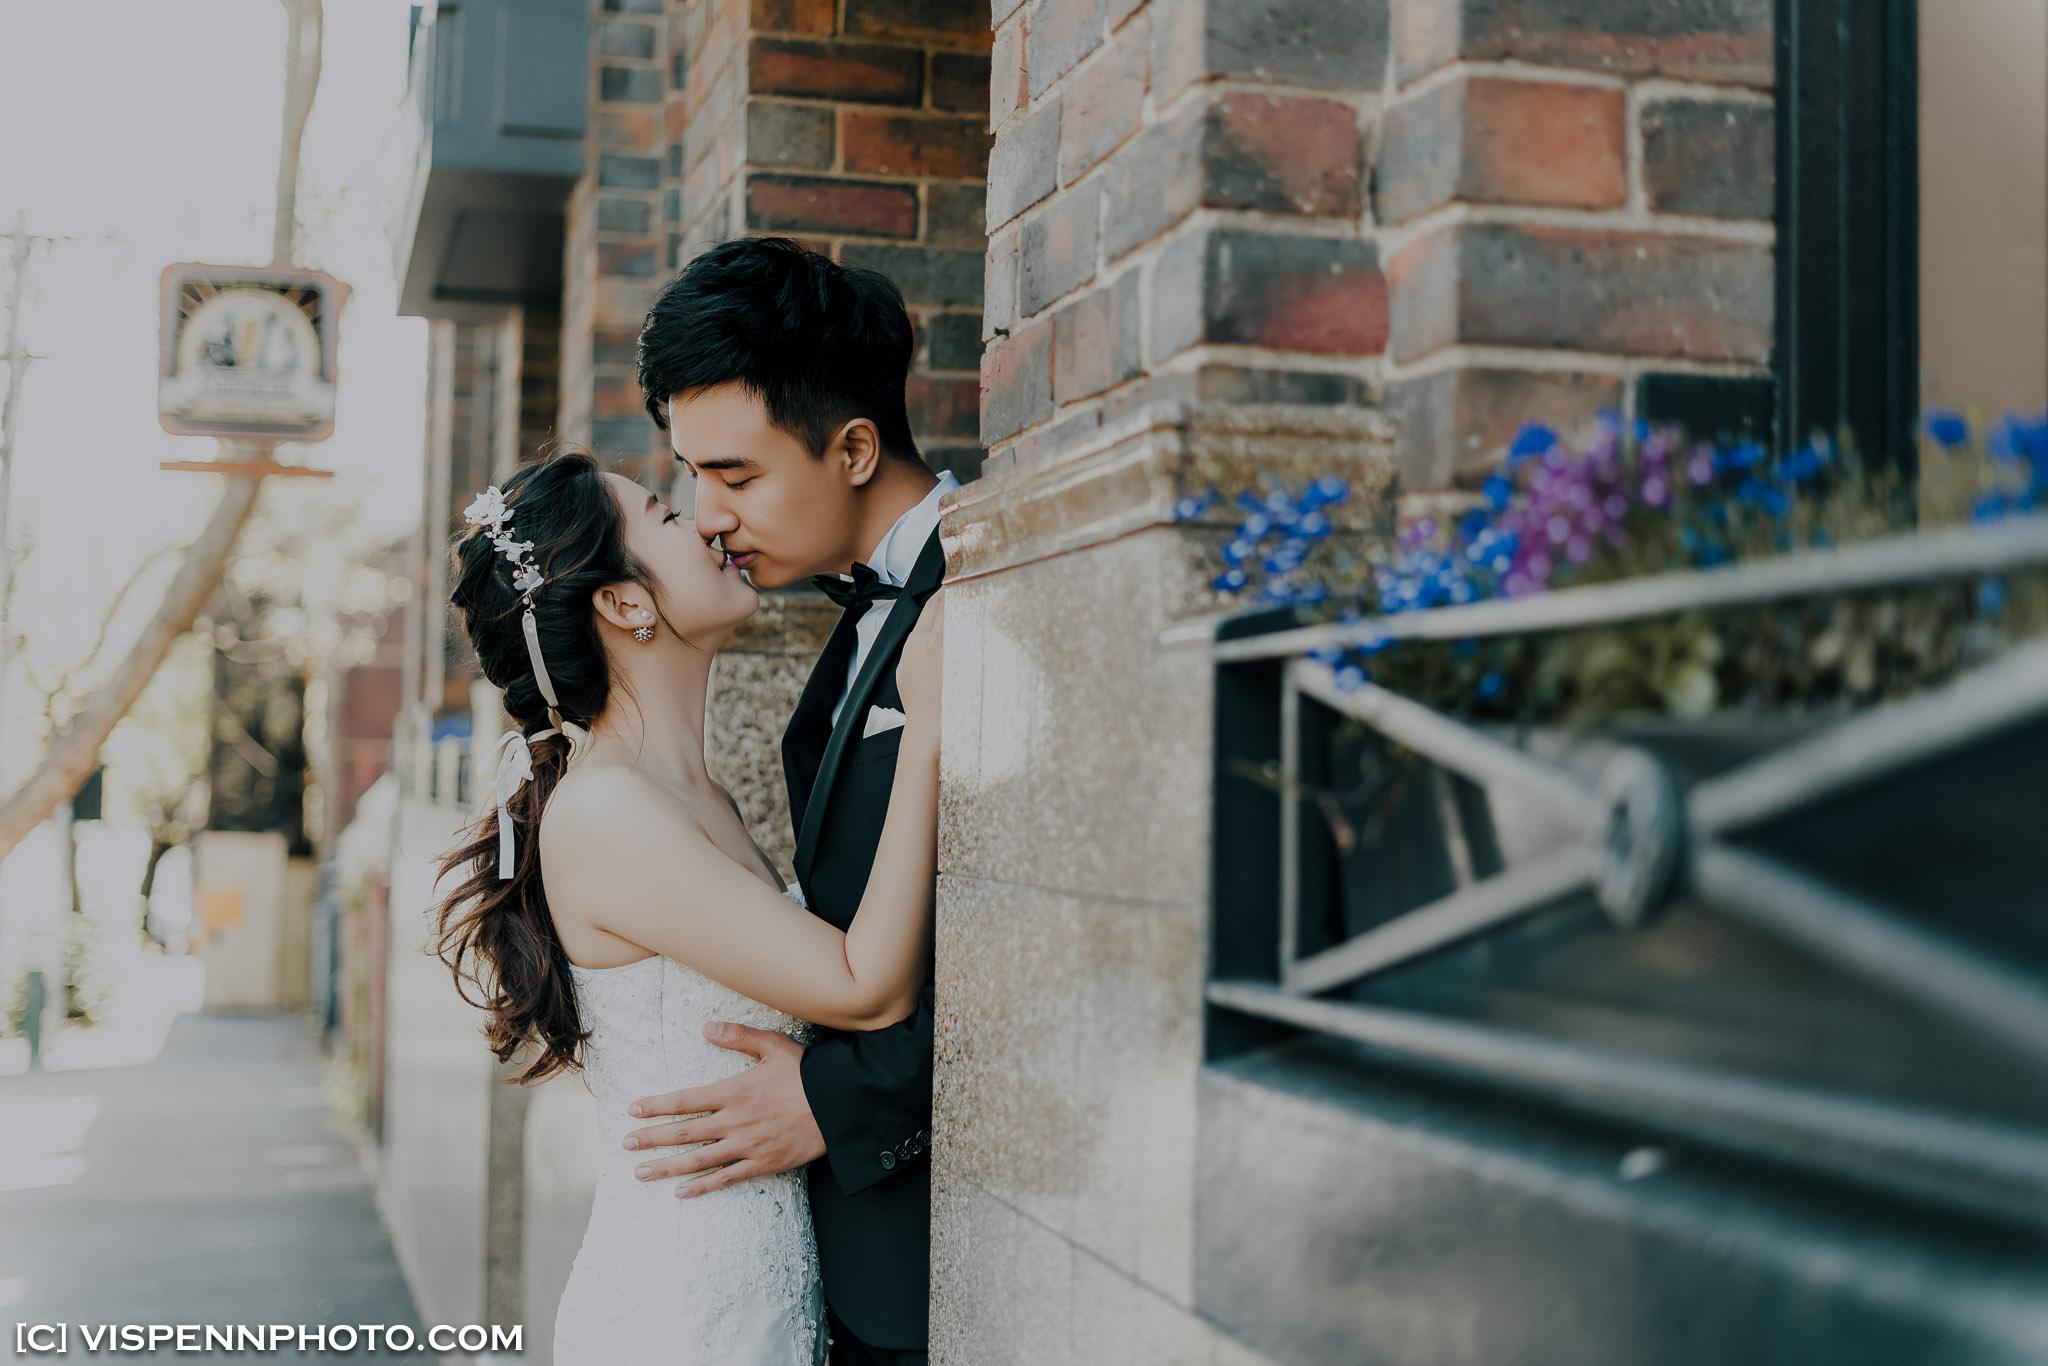 PRE WEDDING Photography Melbourne VISPENN 墨尔本 婚纱照 结婚照 婚纱摄影 VISPENN 1628